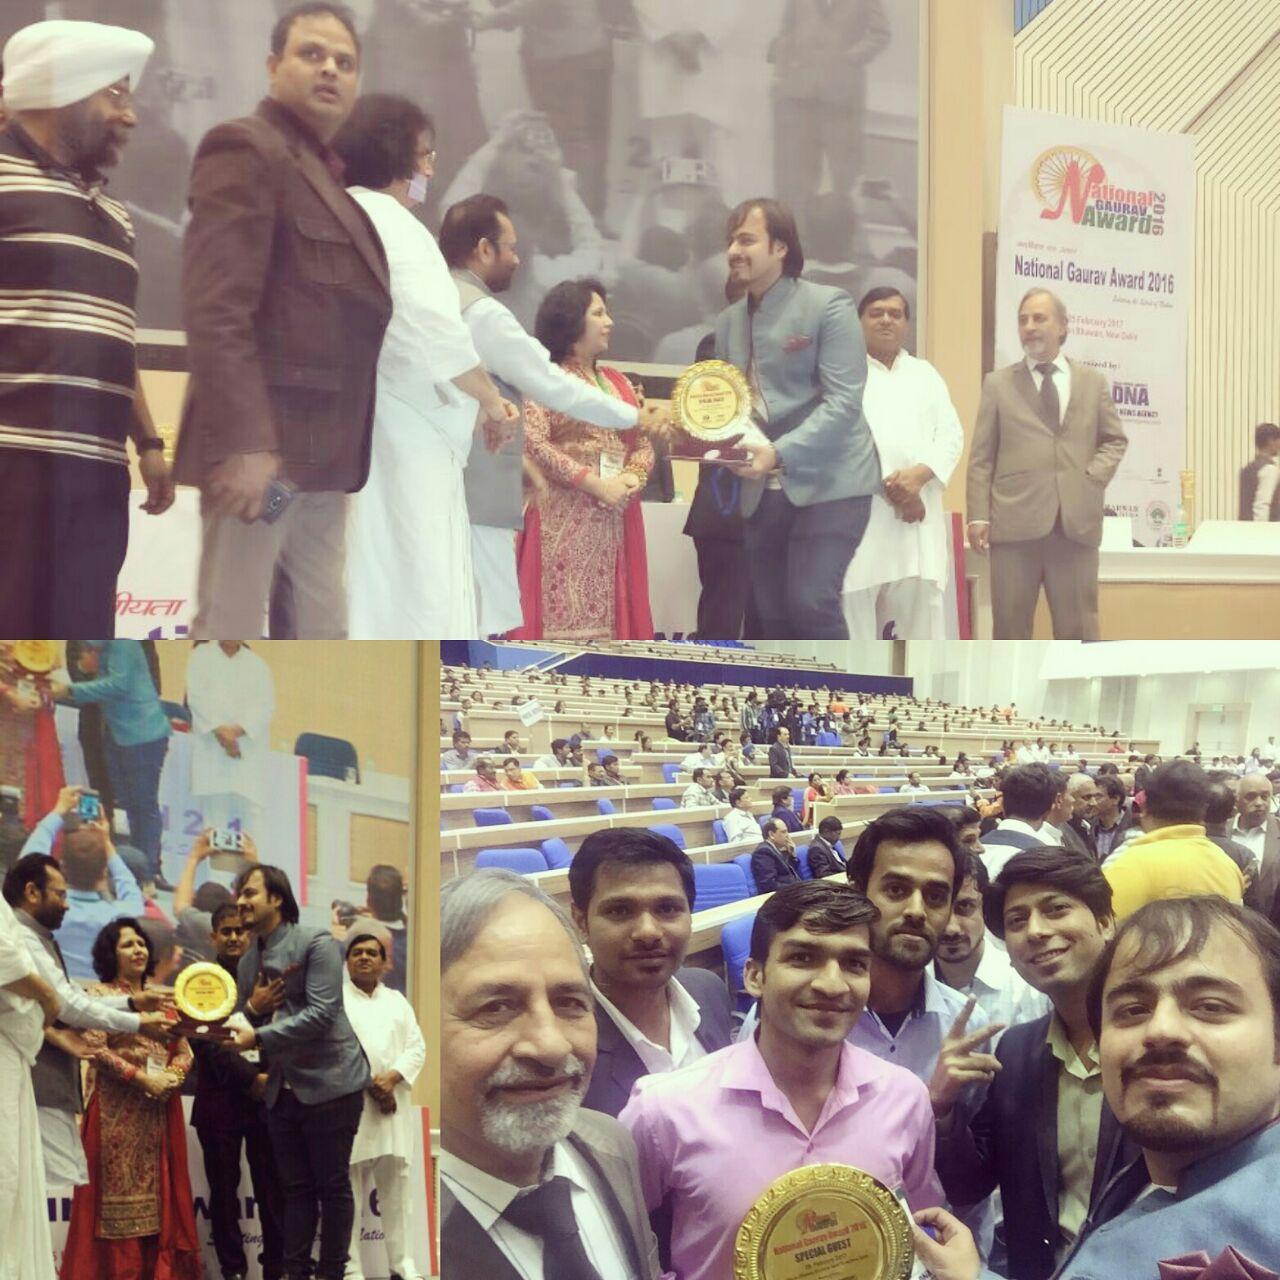 Receiving the National Gaurav Award at Vigyan Bhawan 25 Feb 2017